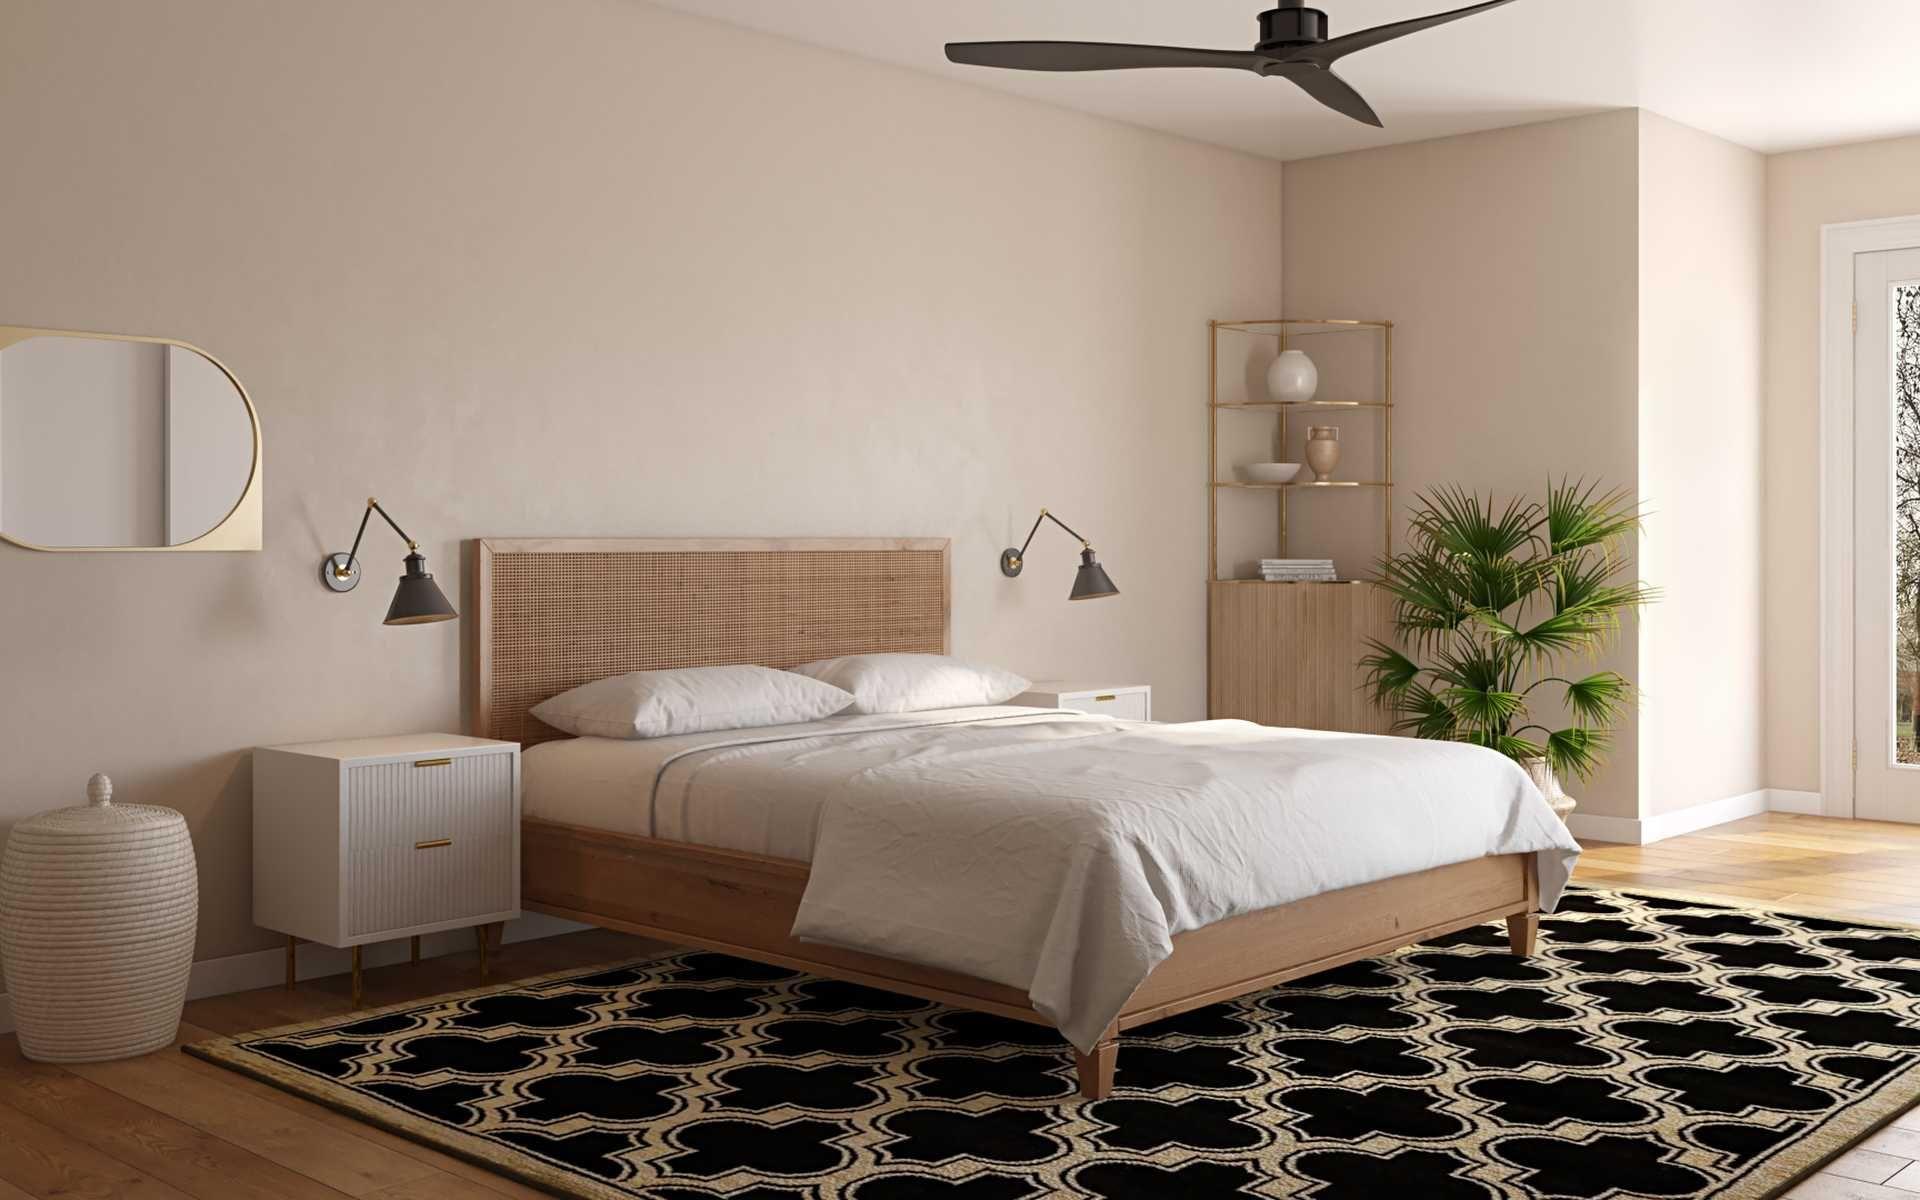 Classic Bohemian Vintage Midcentury Modern Bedroom Design By Havenly Interior Designer Dayu In 2021 Interior Design Bedroom Design Modern Bedroom Design